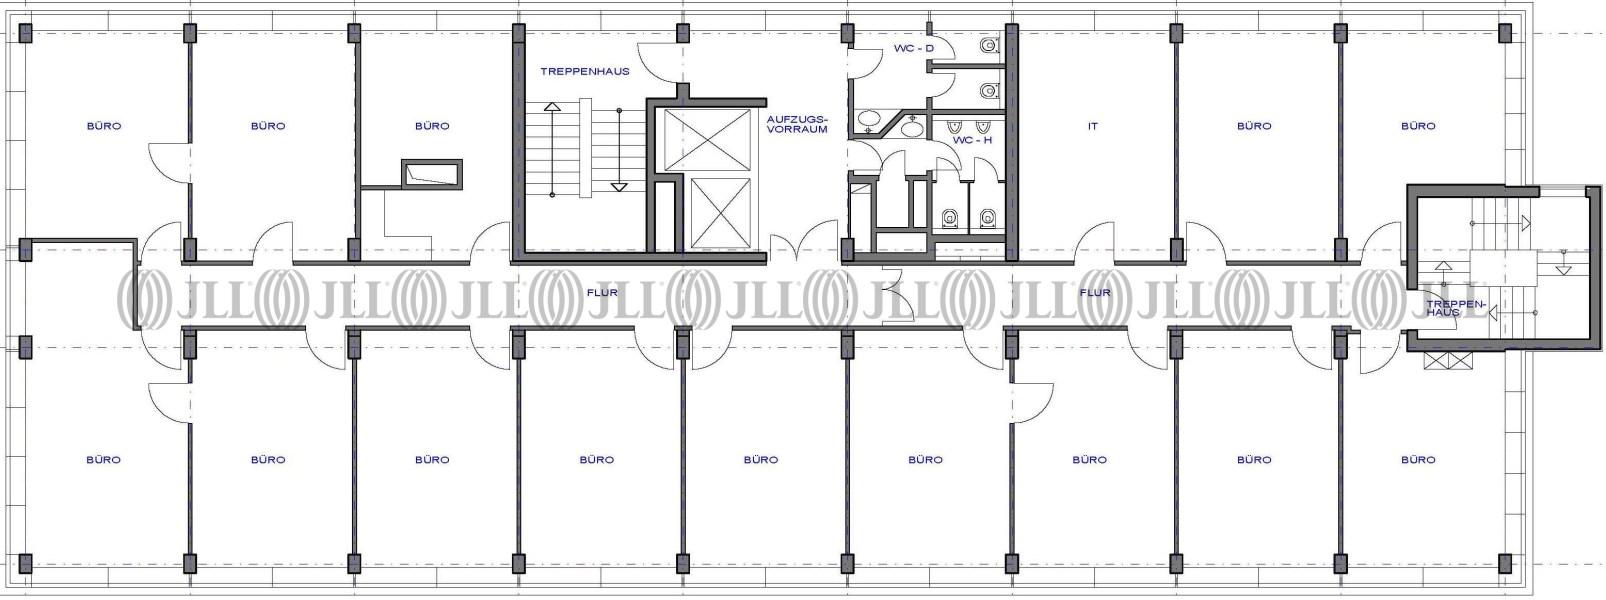 b ro duisburg altstadt d0765 zur miete jll. Black Bedroom Furniture Sets. Home Design Ideas